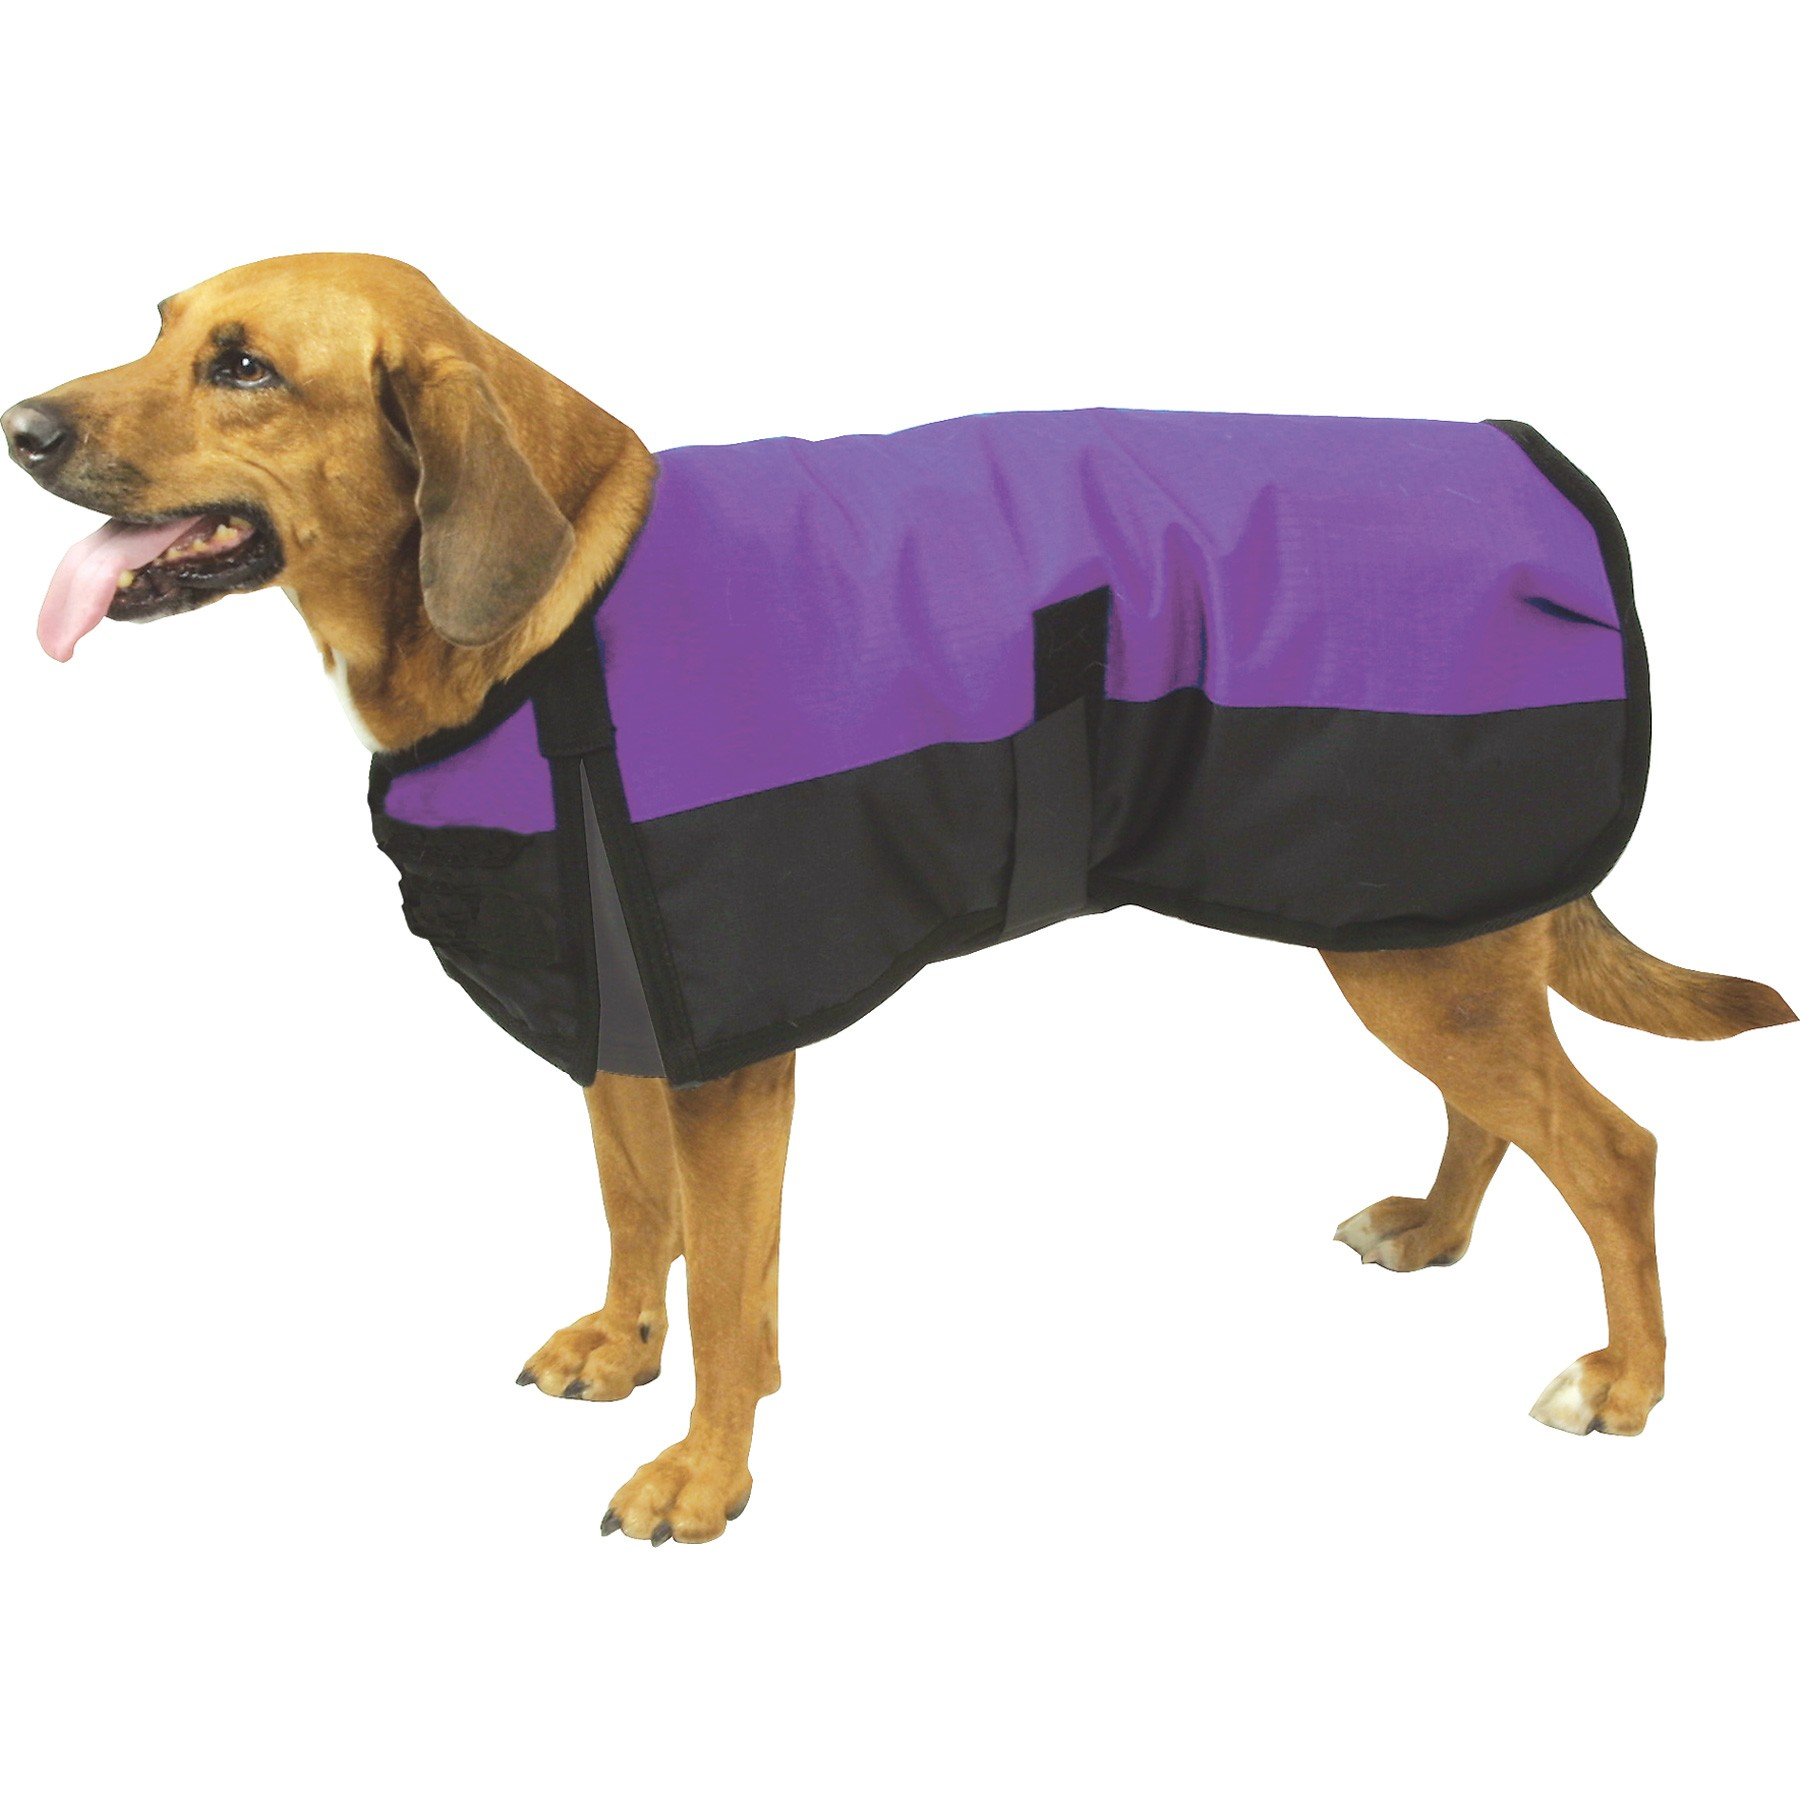 Waterproof Dog Jacket photo - 3